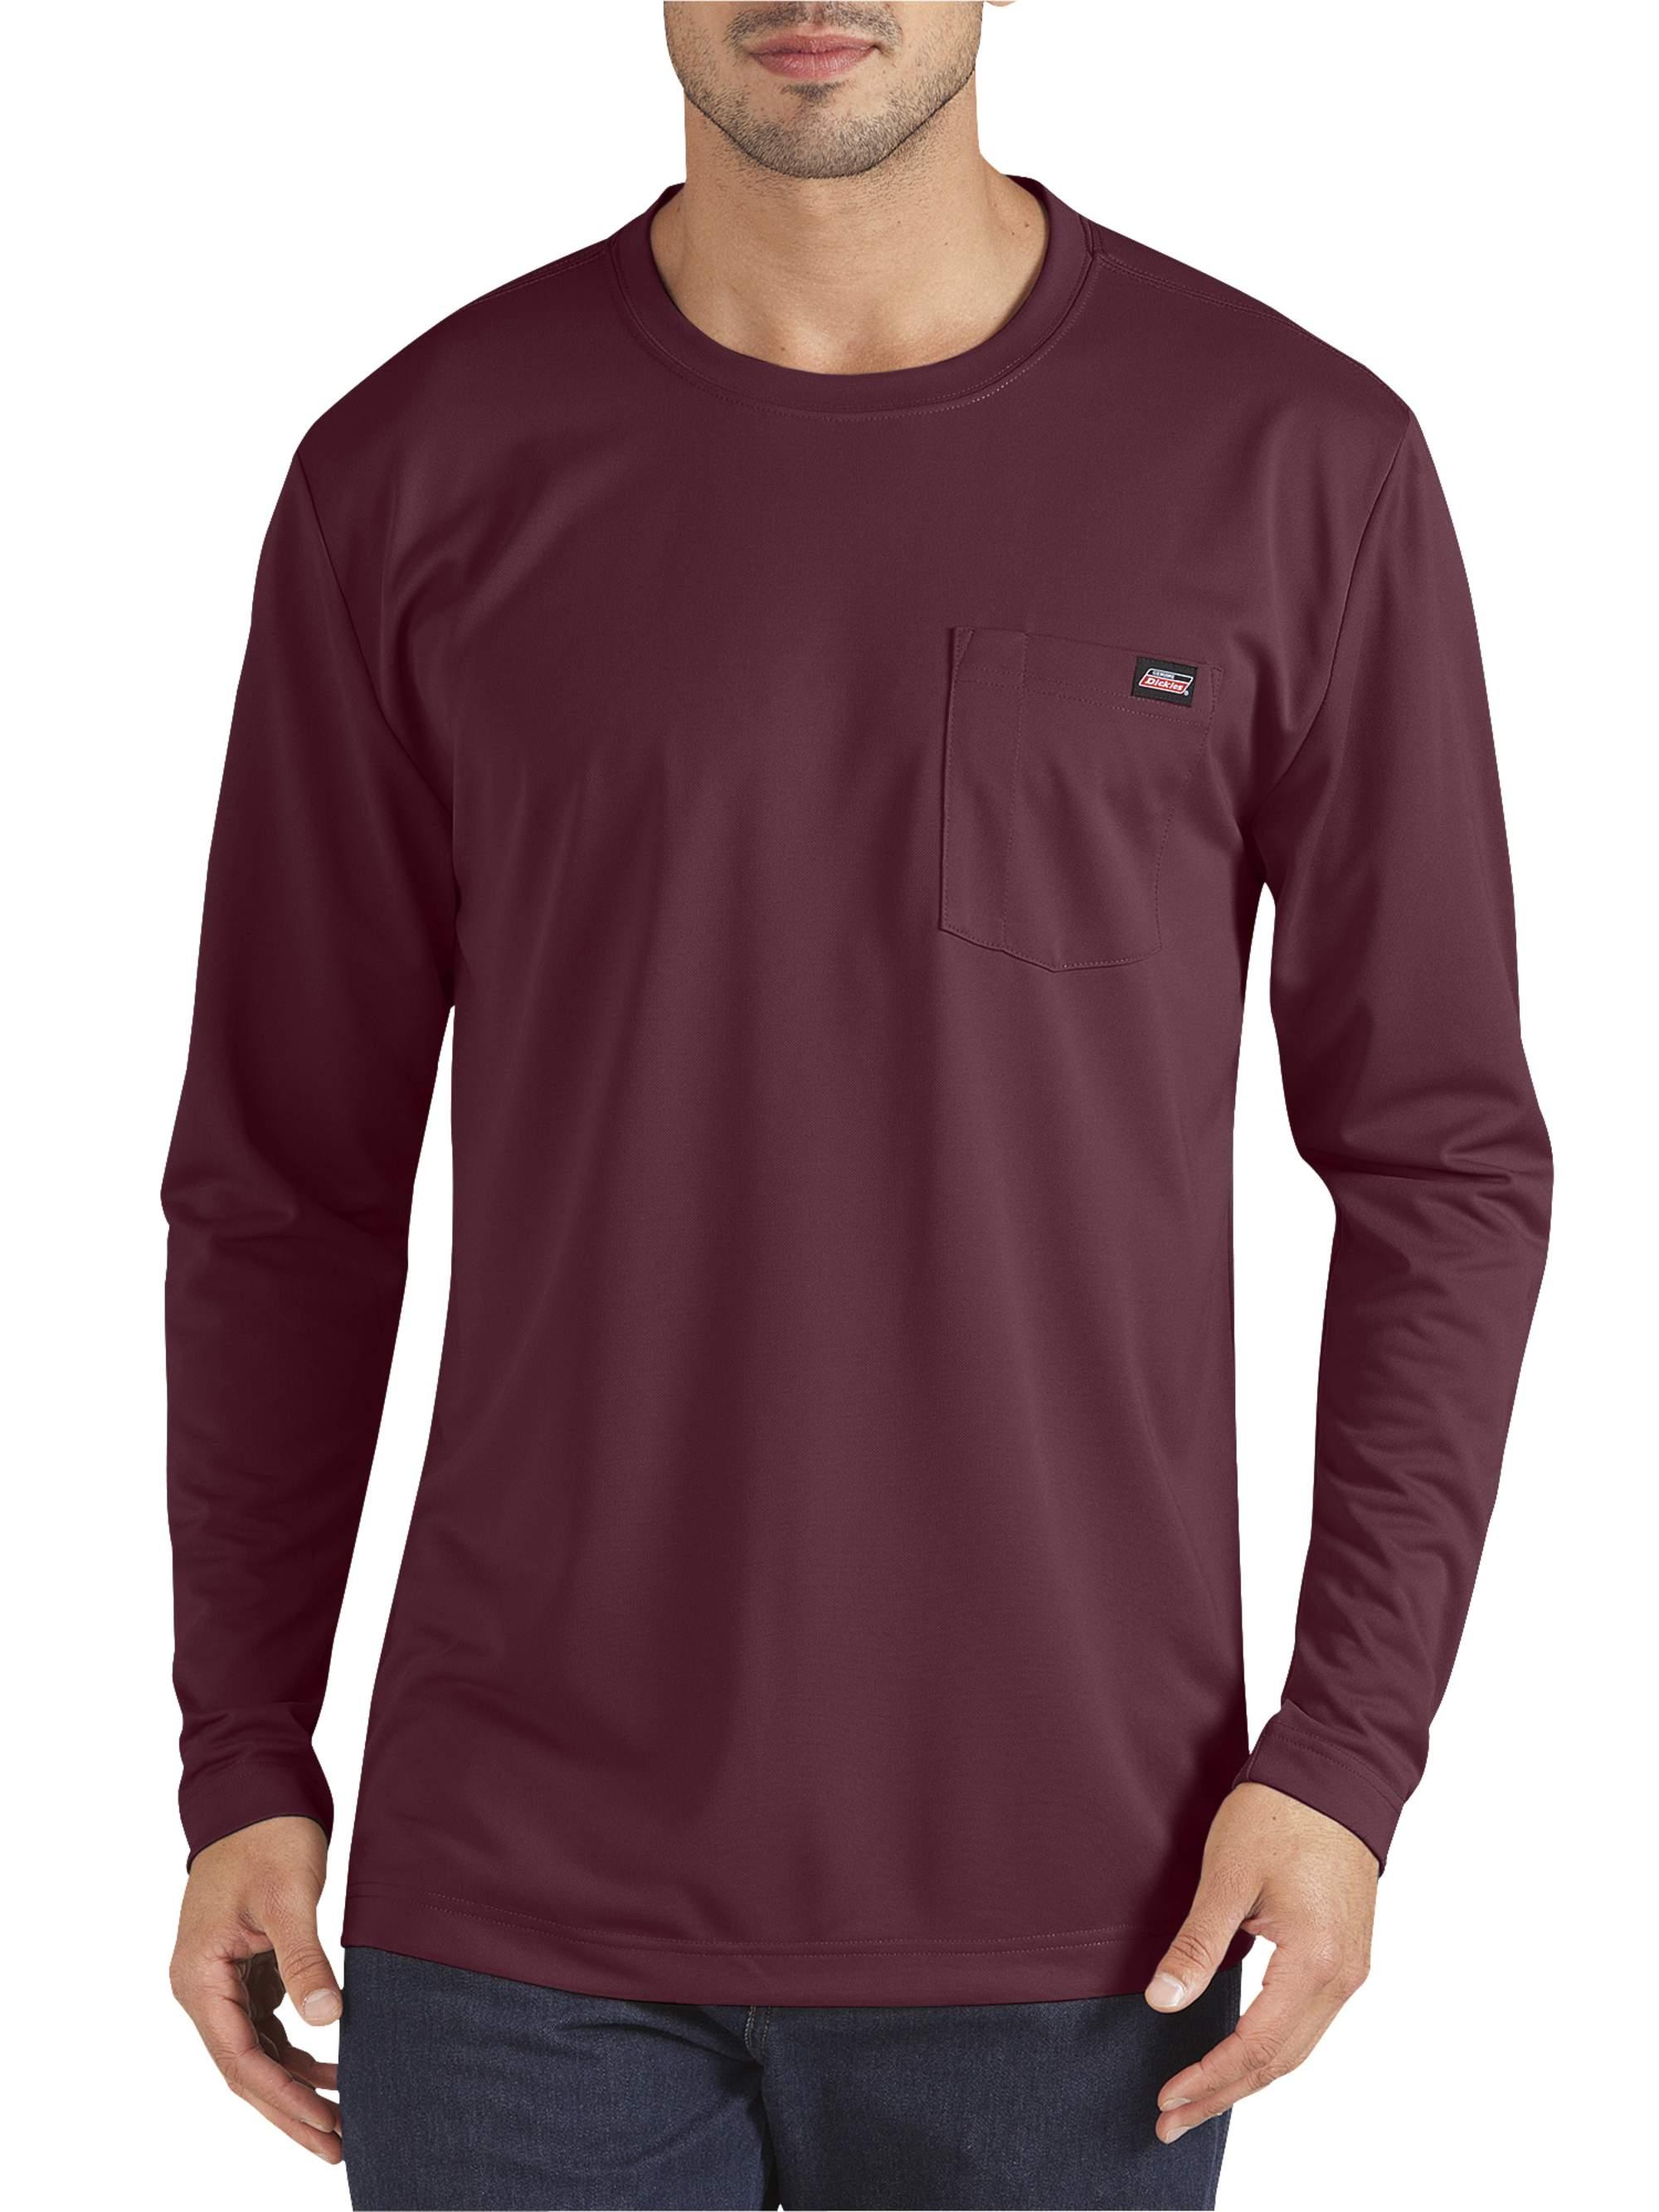 Men's Long Sleeve Performance Pocket T-Shirt